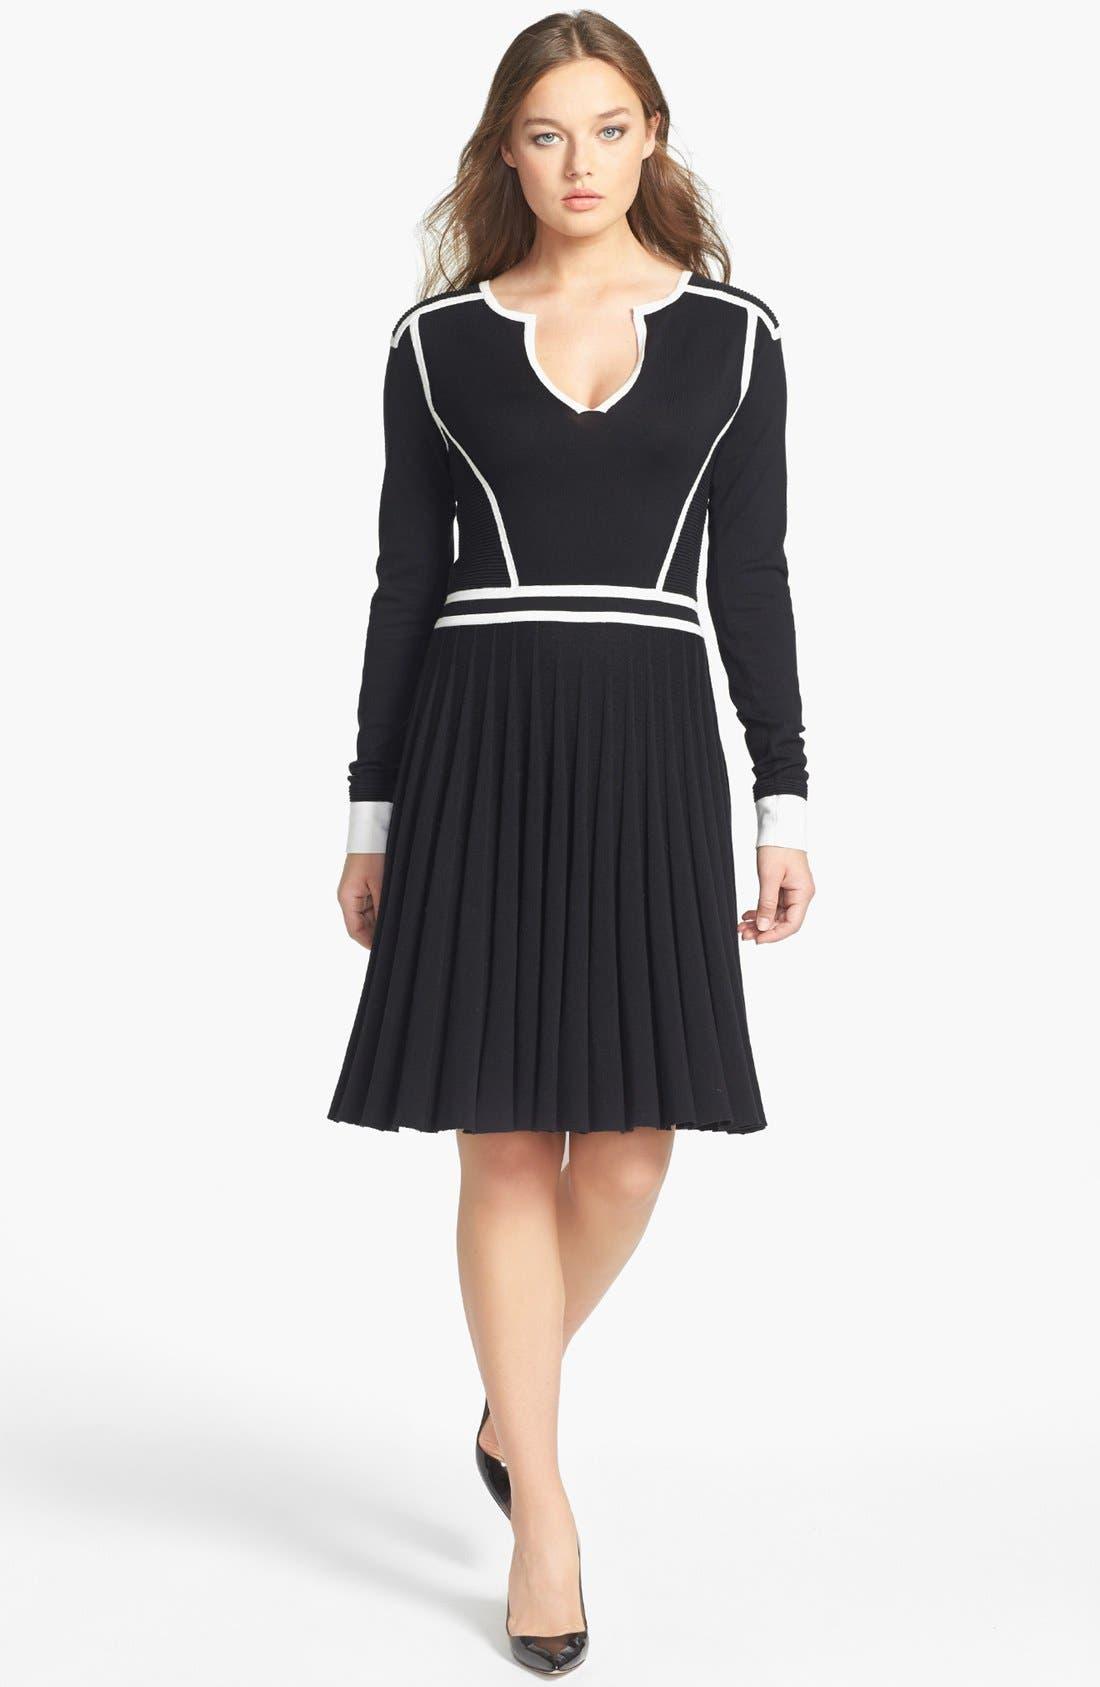 Main Image - MARC BY MARC JACOBS 'Alexis' Cotton Blend Sweater Dress